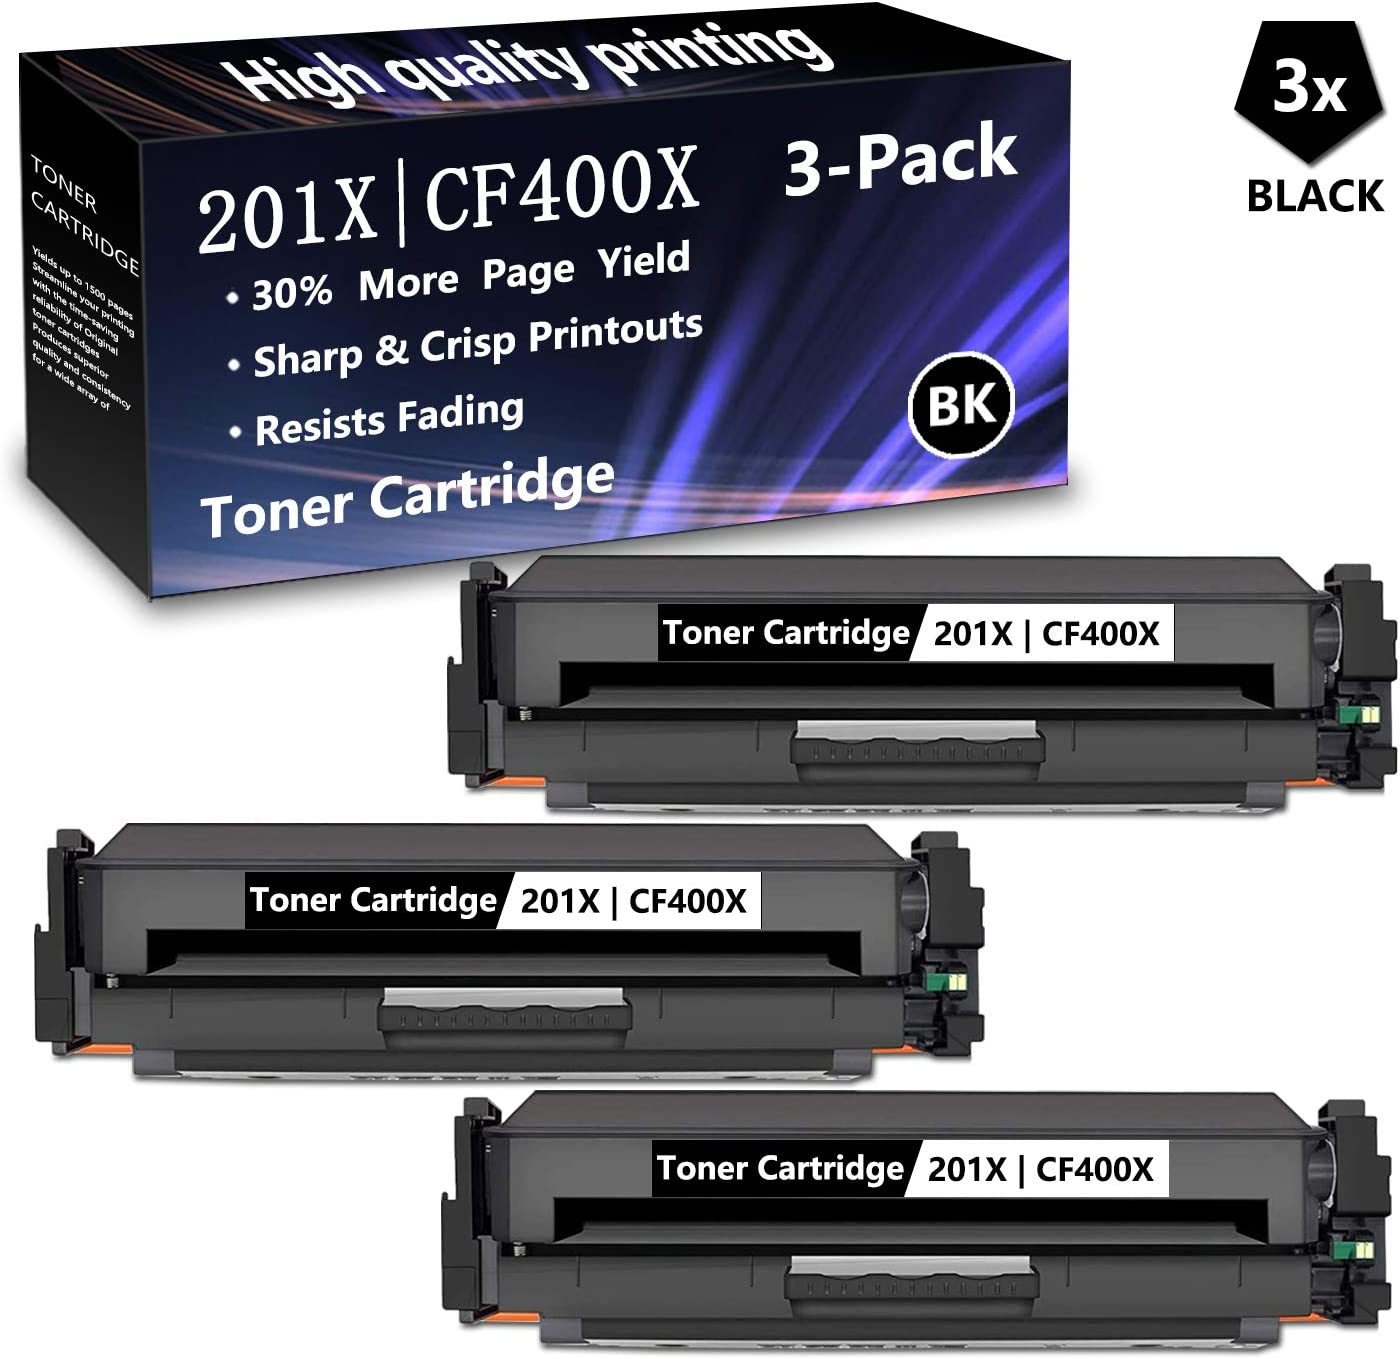 3 Black 201X CF400X High Yield Compatible Toner Cartridge Replacement for HP Color Laserjet M252dw M252n MFP M277n MFP M277dw MFP M277c6 MFP M274n Printers,Sold by AlToner 3 Pack